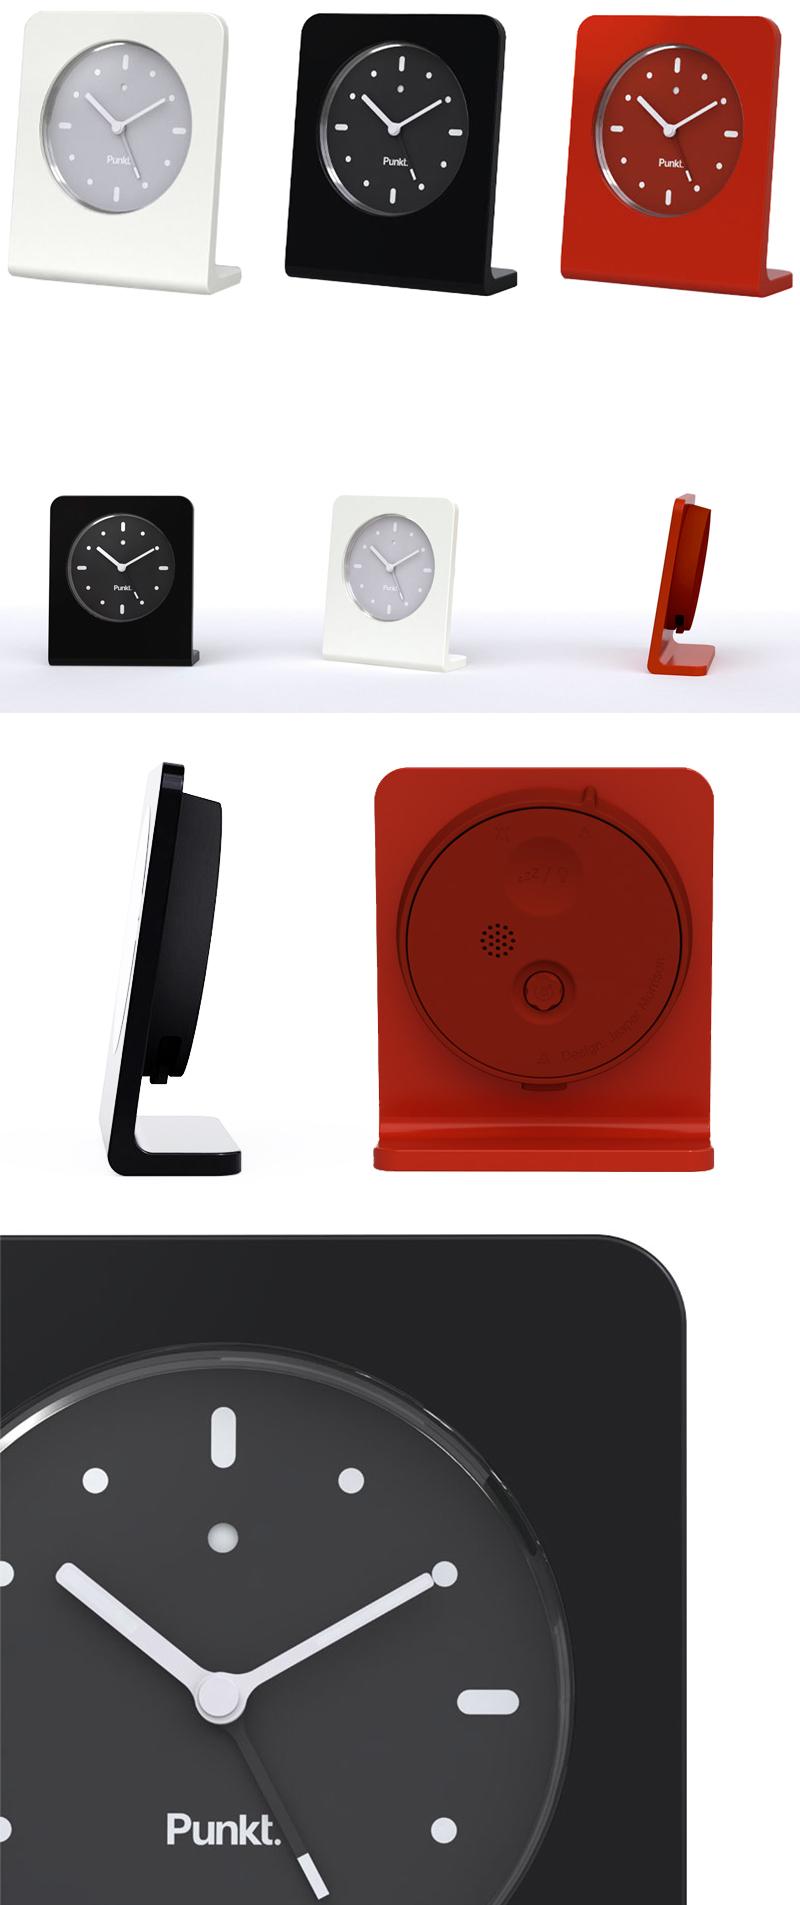 Jasper morrison punkt alarm clock nova68 modern design for Designer alarm clock